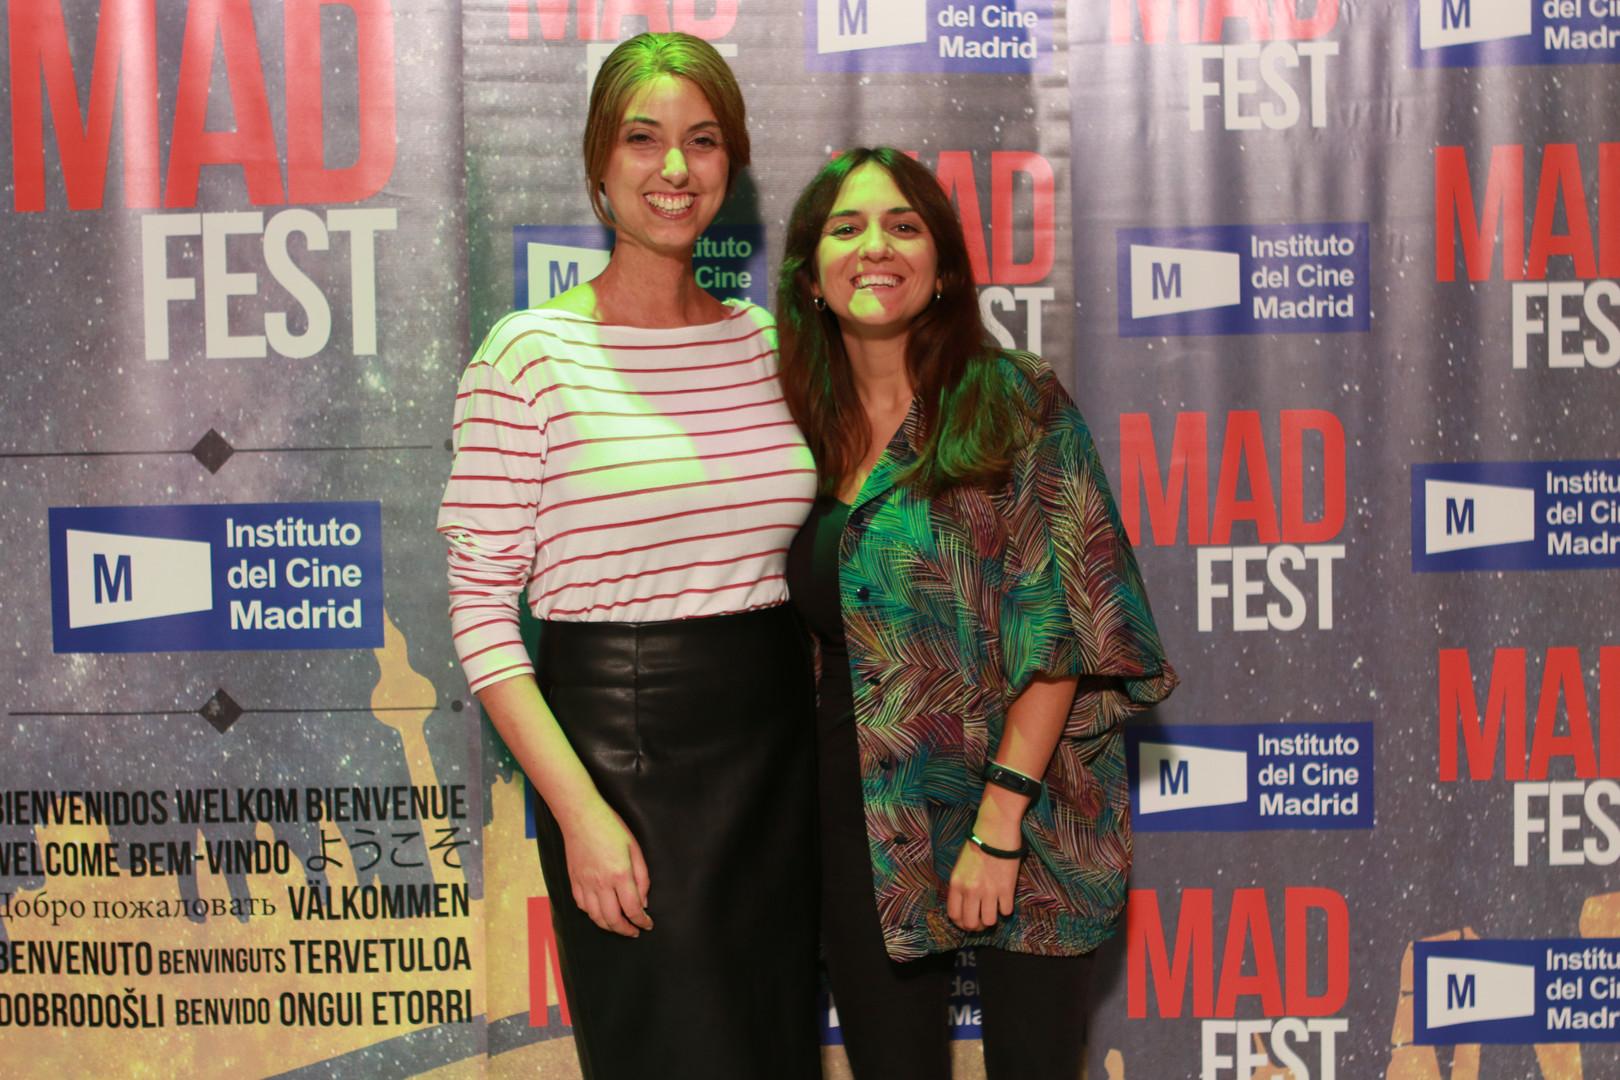 Festival de cine madrid